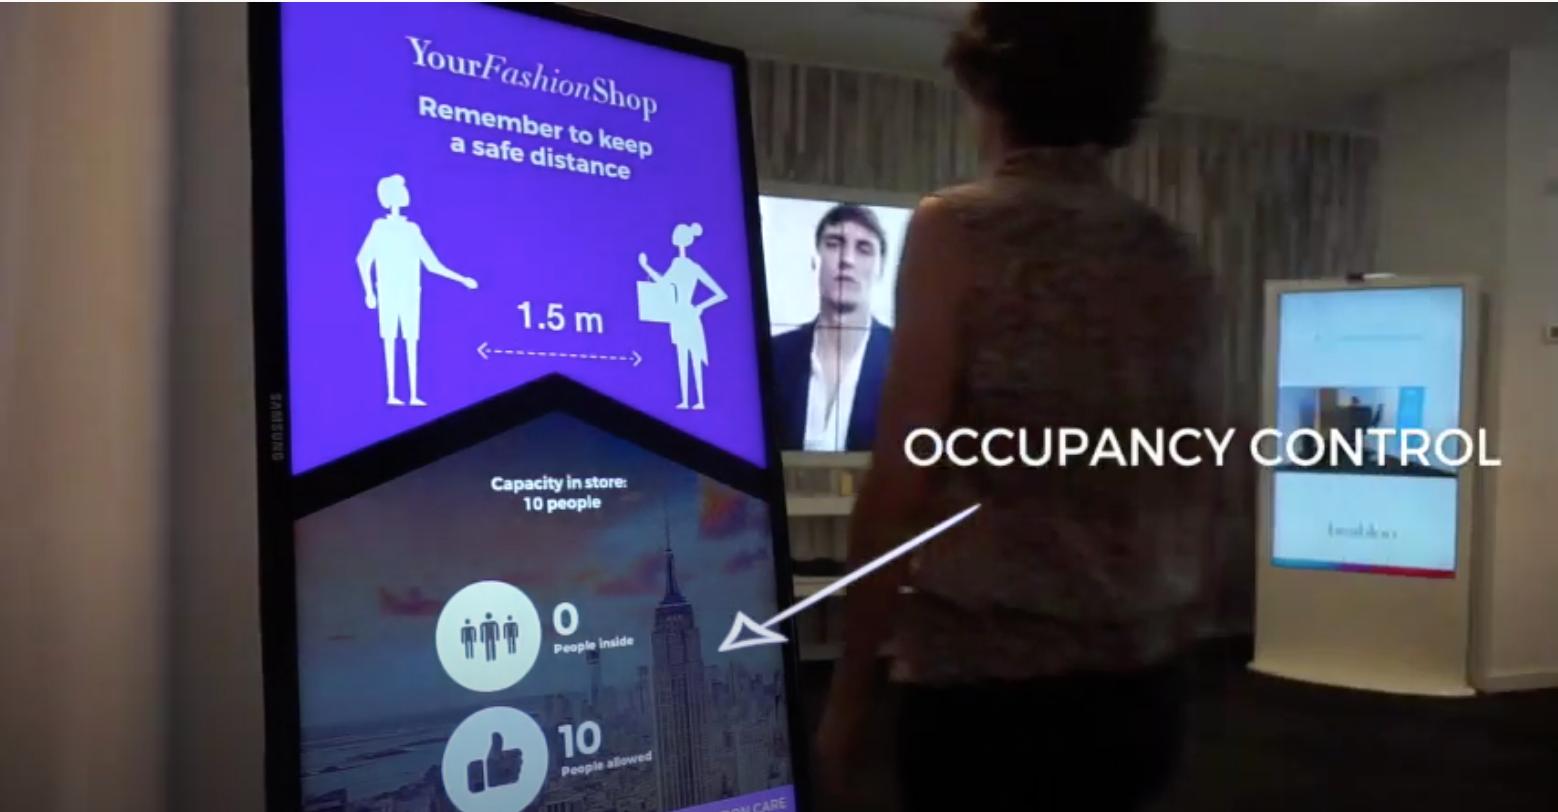 smart digital signage for occupancy control